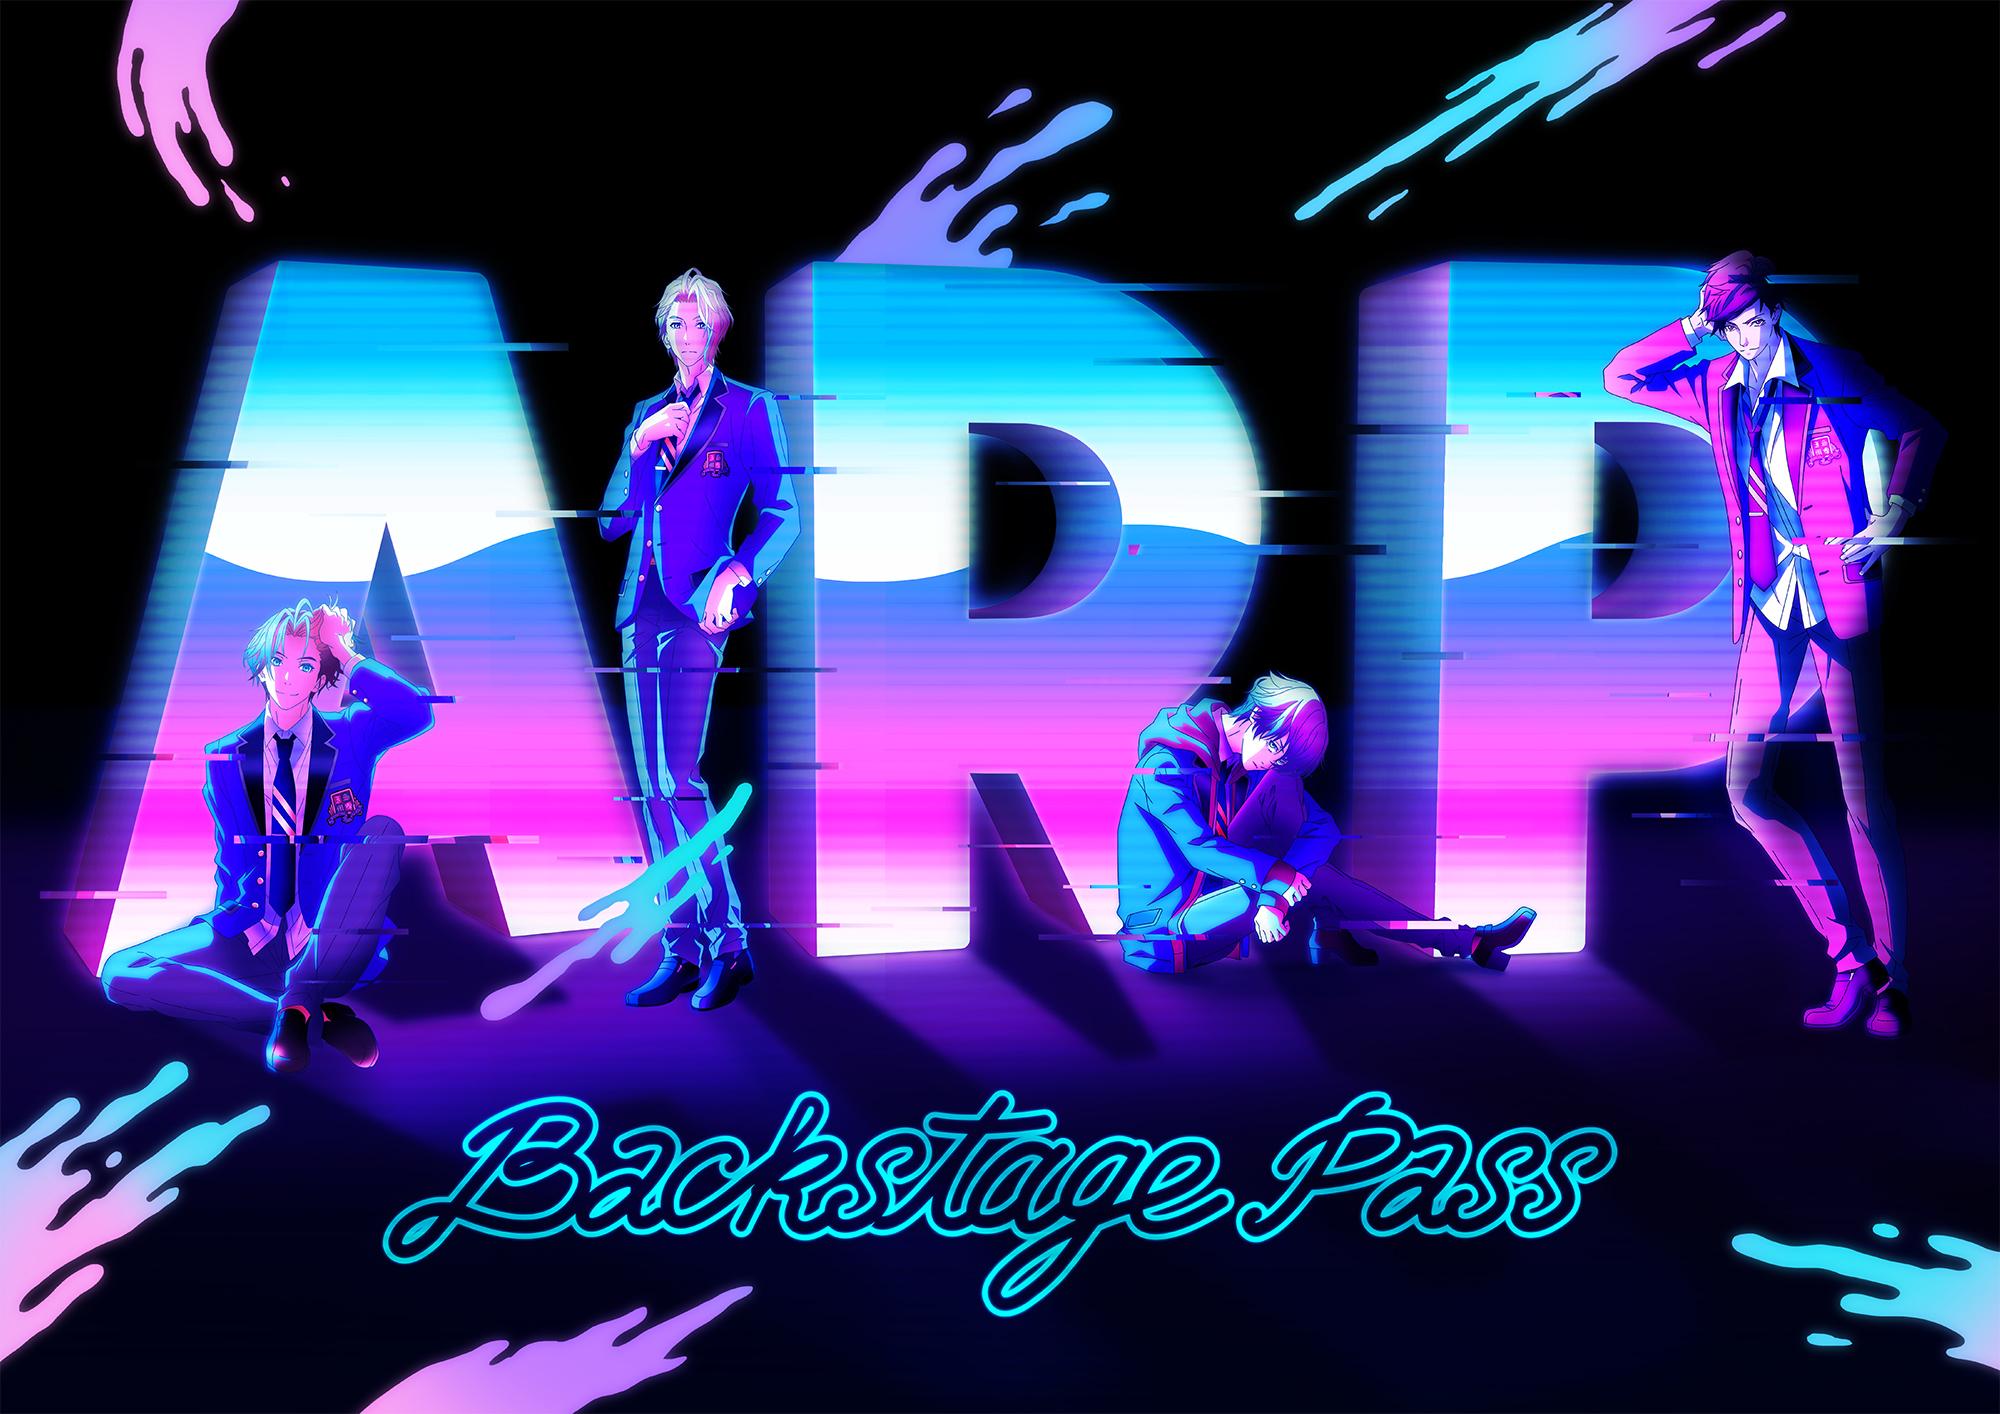 TVアニメ『ARP Backstage Pass』  (C)ARPAP